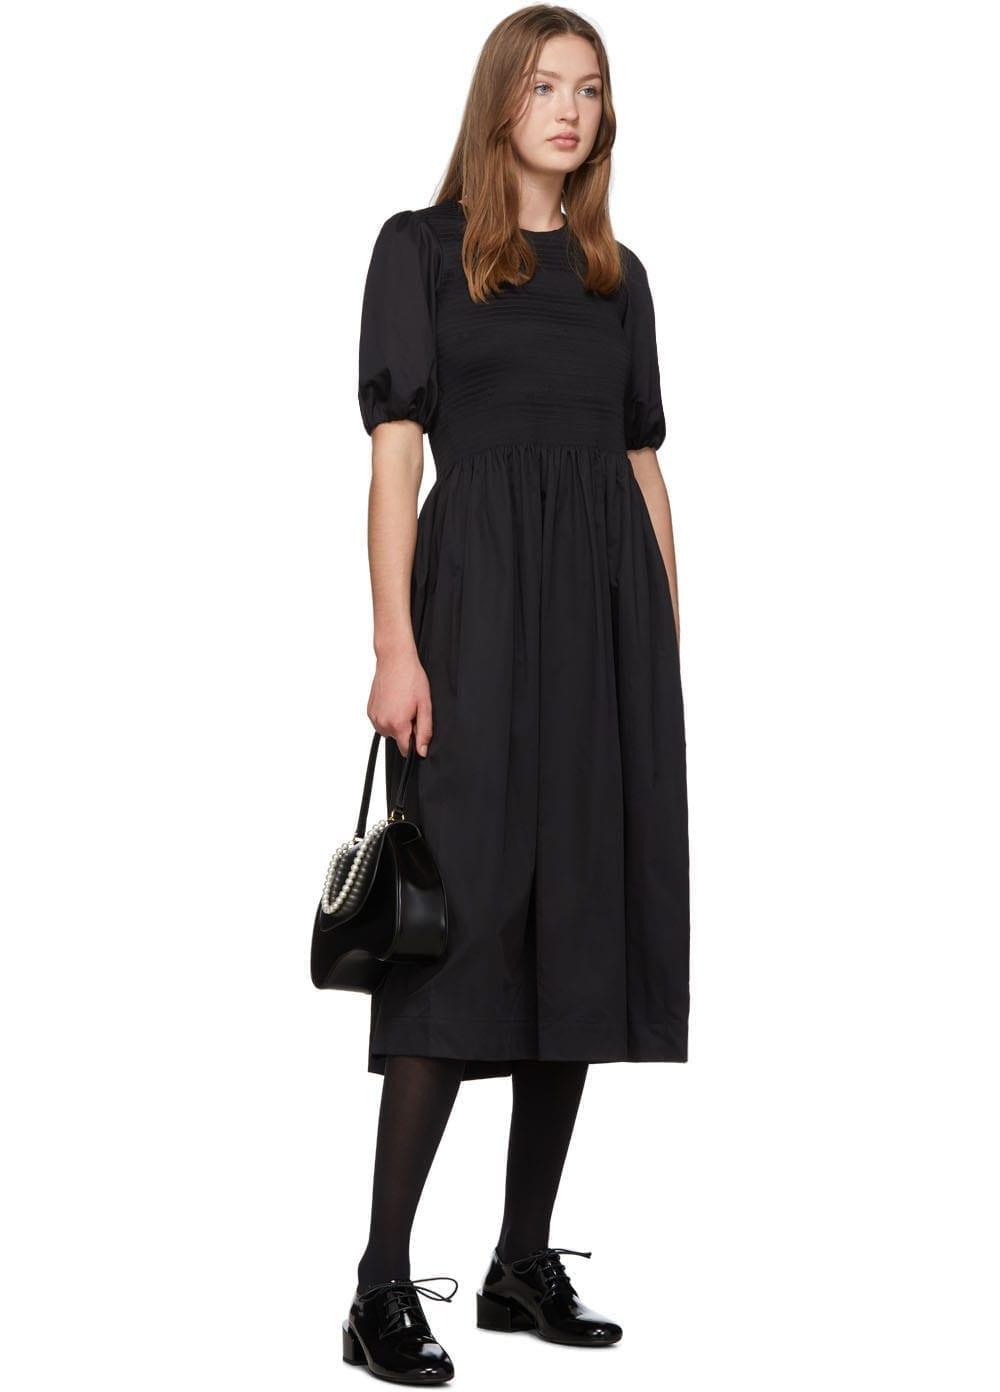 MOLLY GODDARD Black Rory Dress